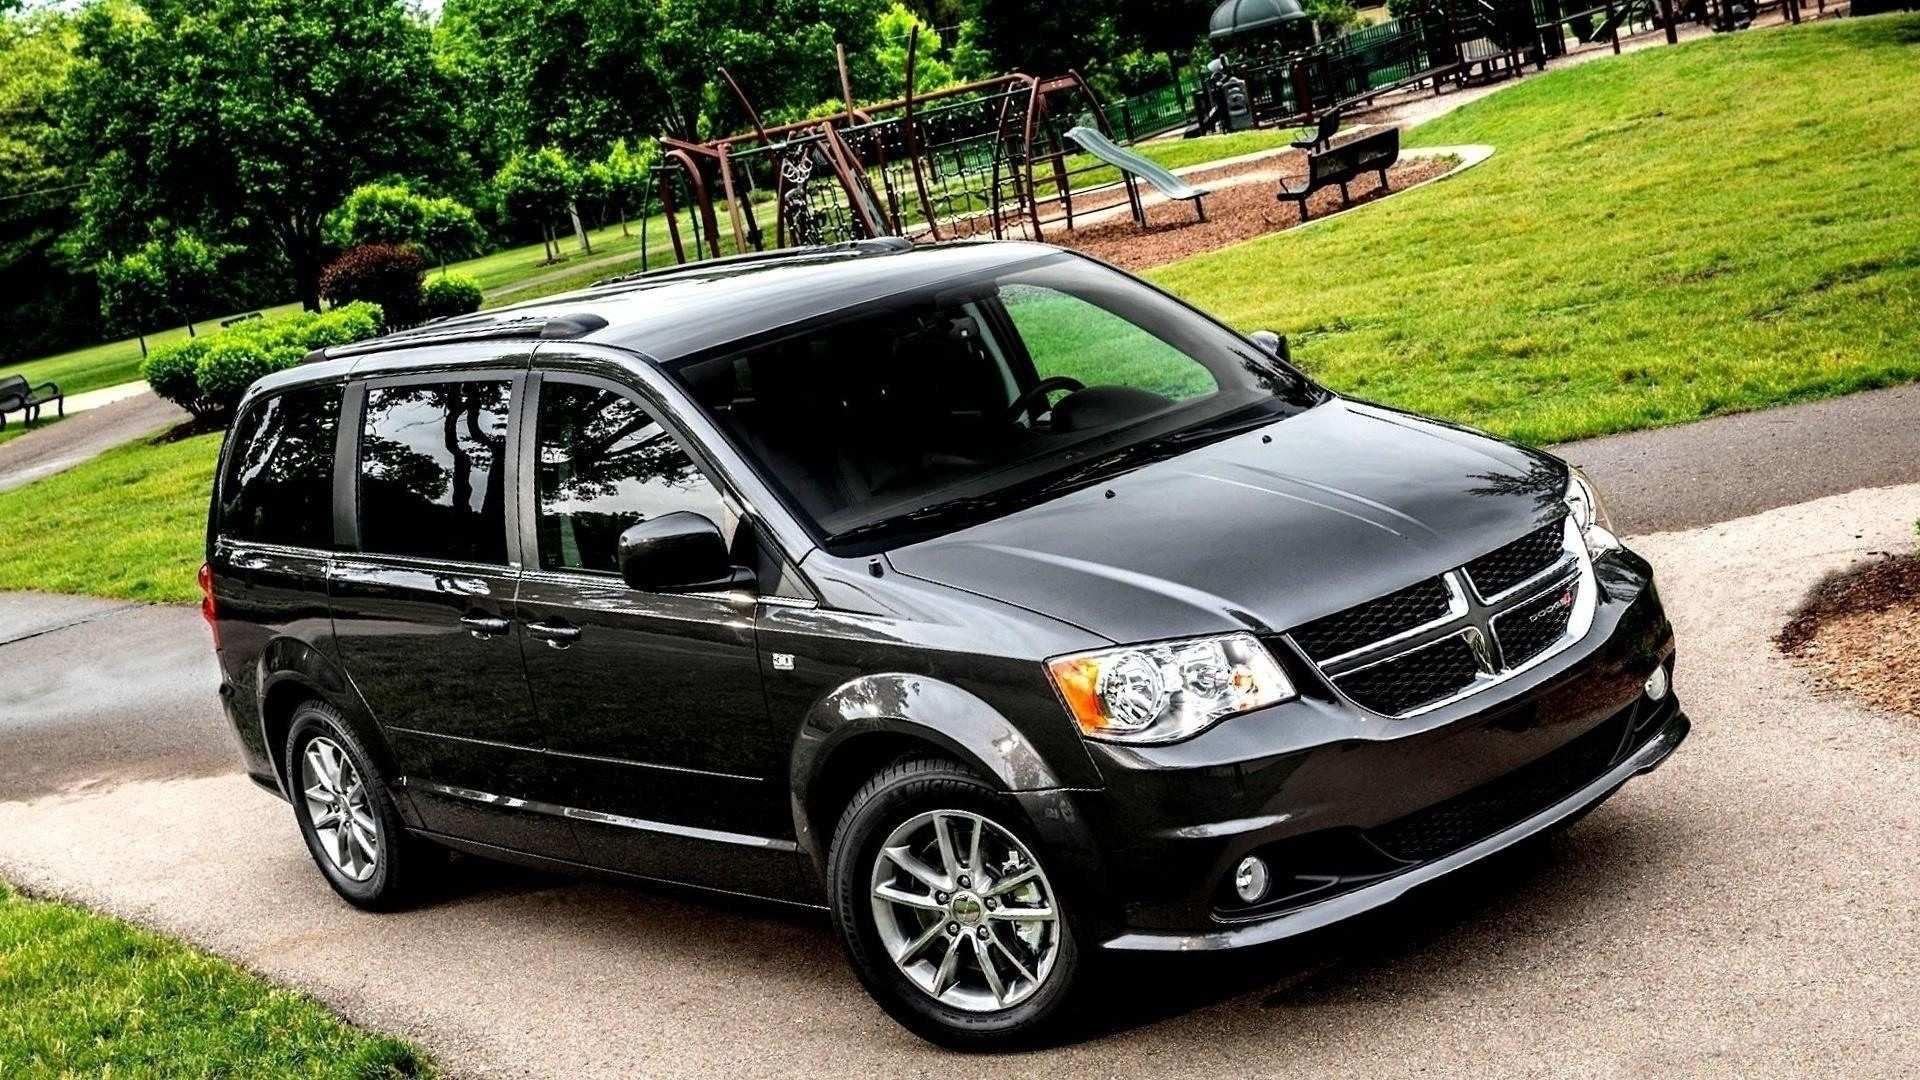 94 Great 2019 Dodge Grand Caravan Specs And Review Pictures for 2019 Dodge Grand Caravan Specs And Review